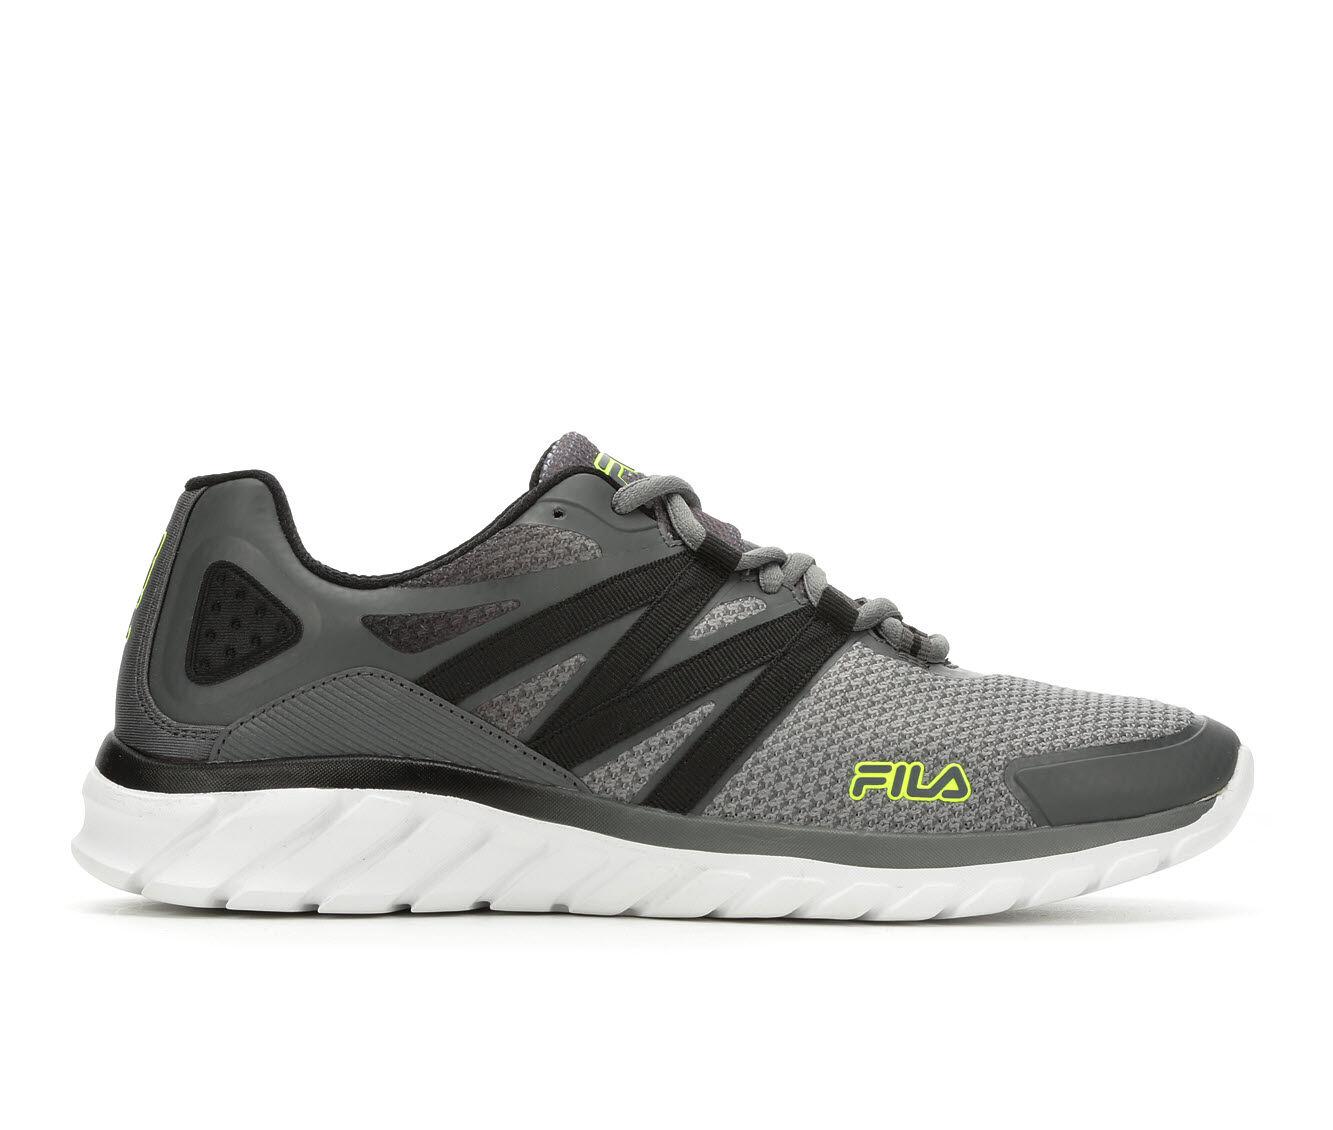 Men's Fila Memory Liftoff Running Shoes Gry/Wht/Blk/Vlt